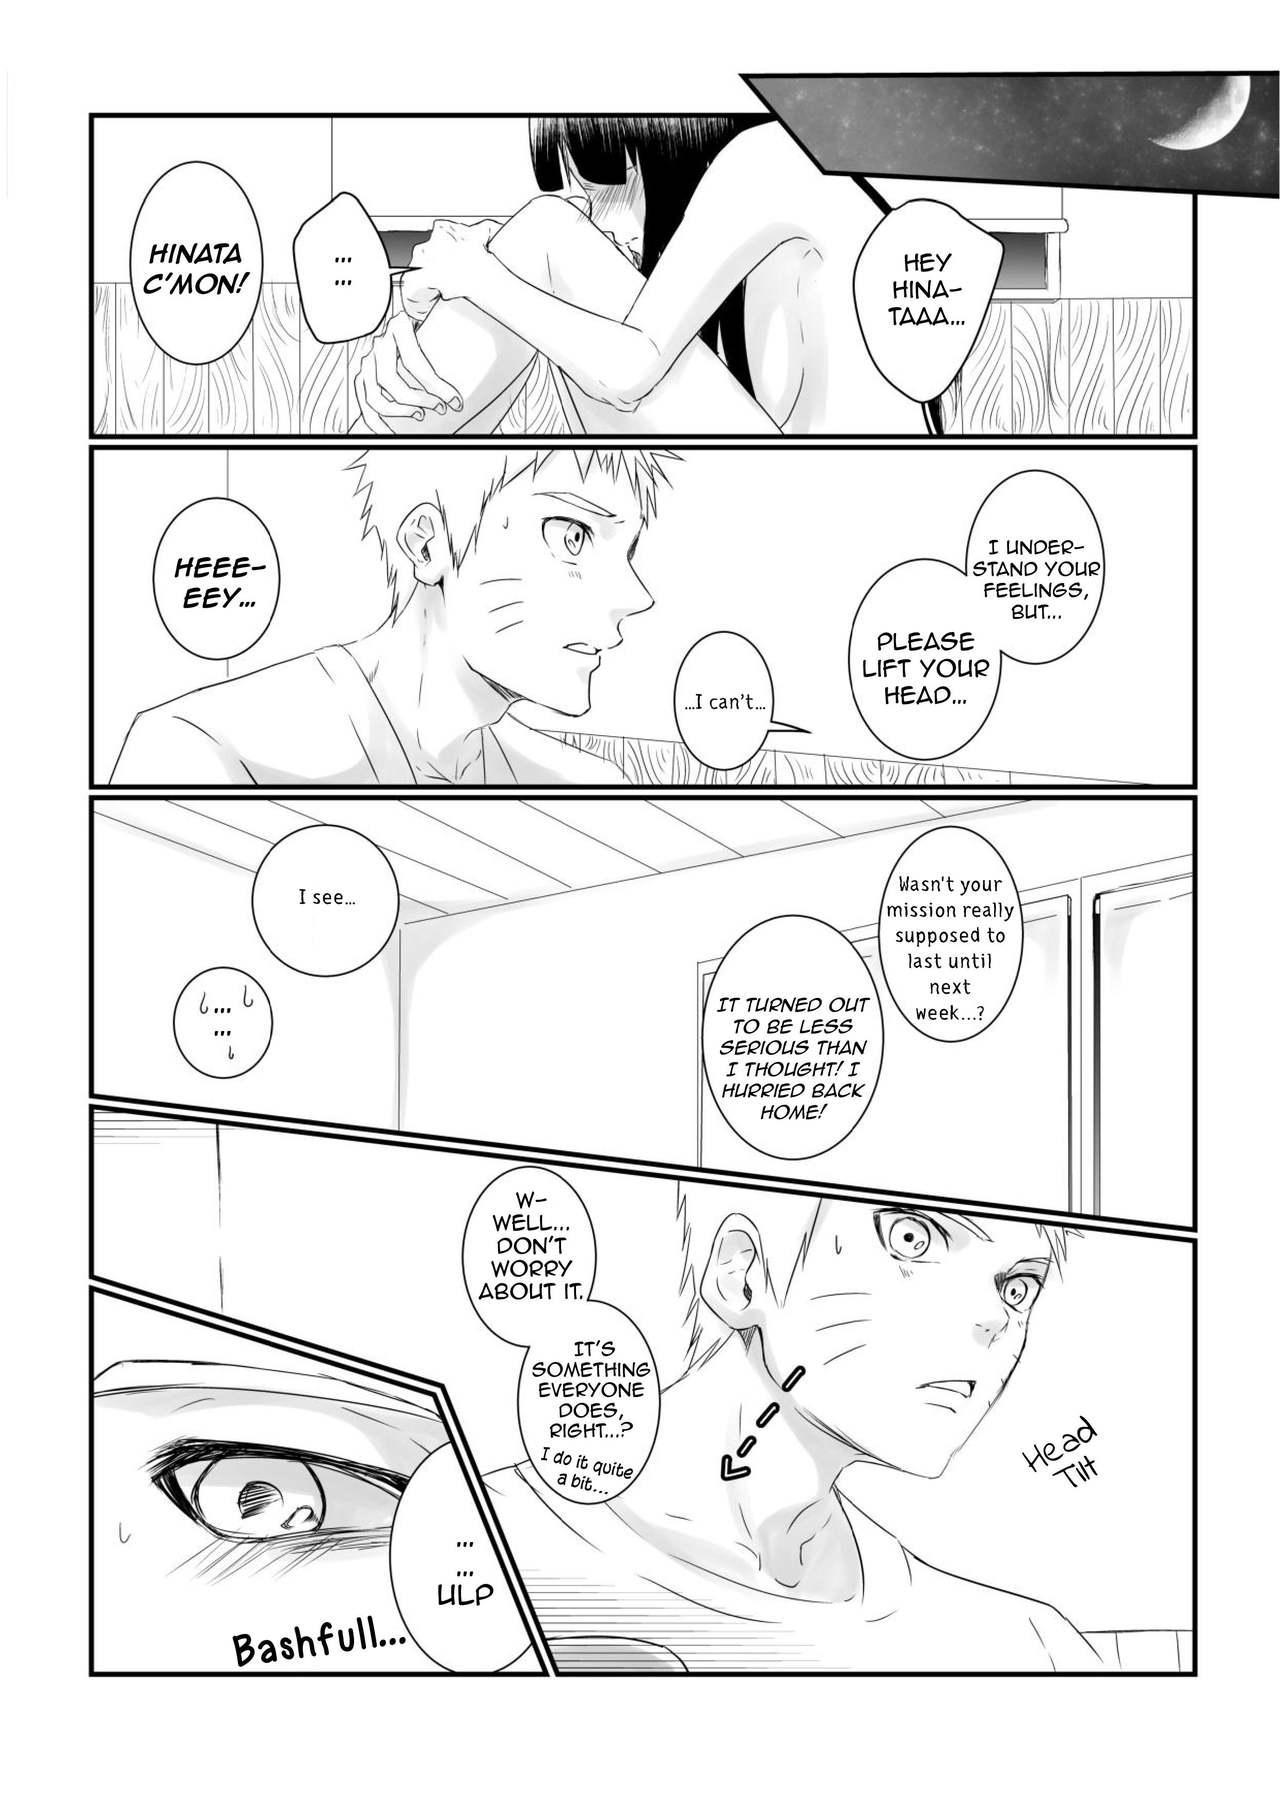 Do you hate lewd Hinata? 3